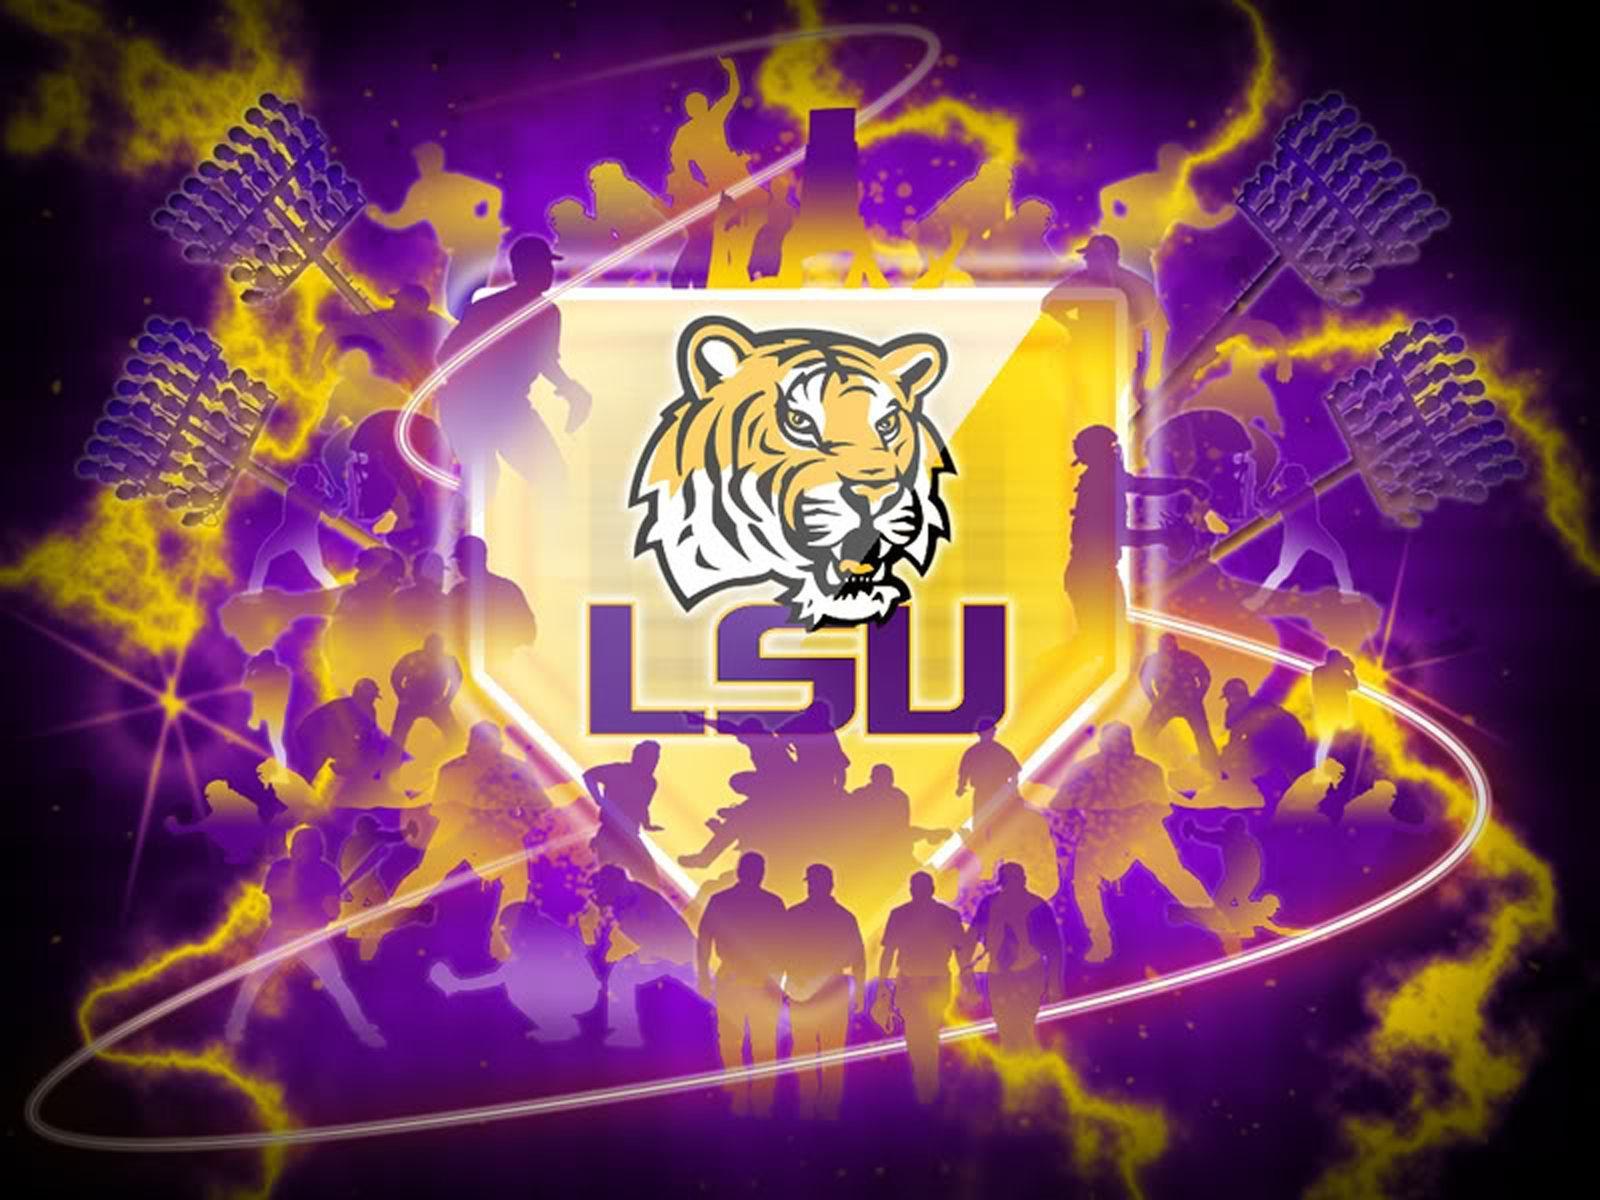 LSU Wallpapers - Top Free LSU